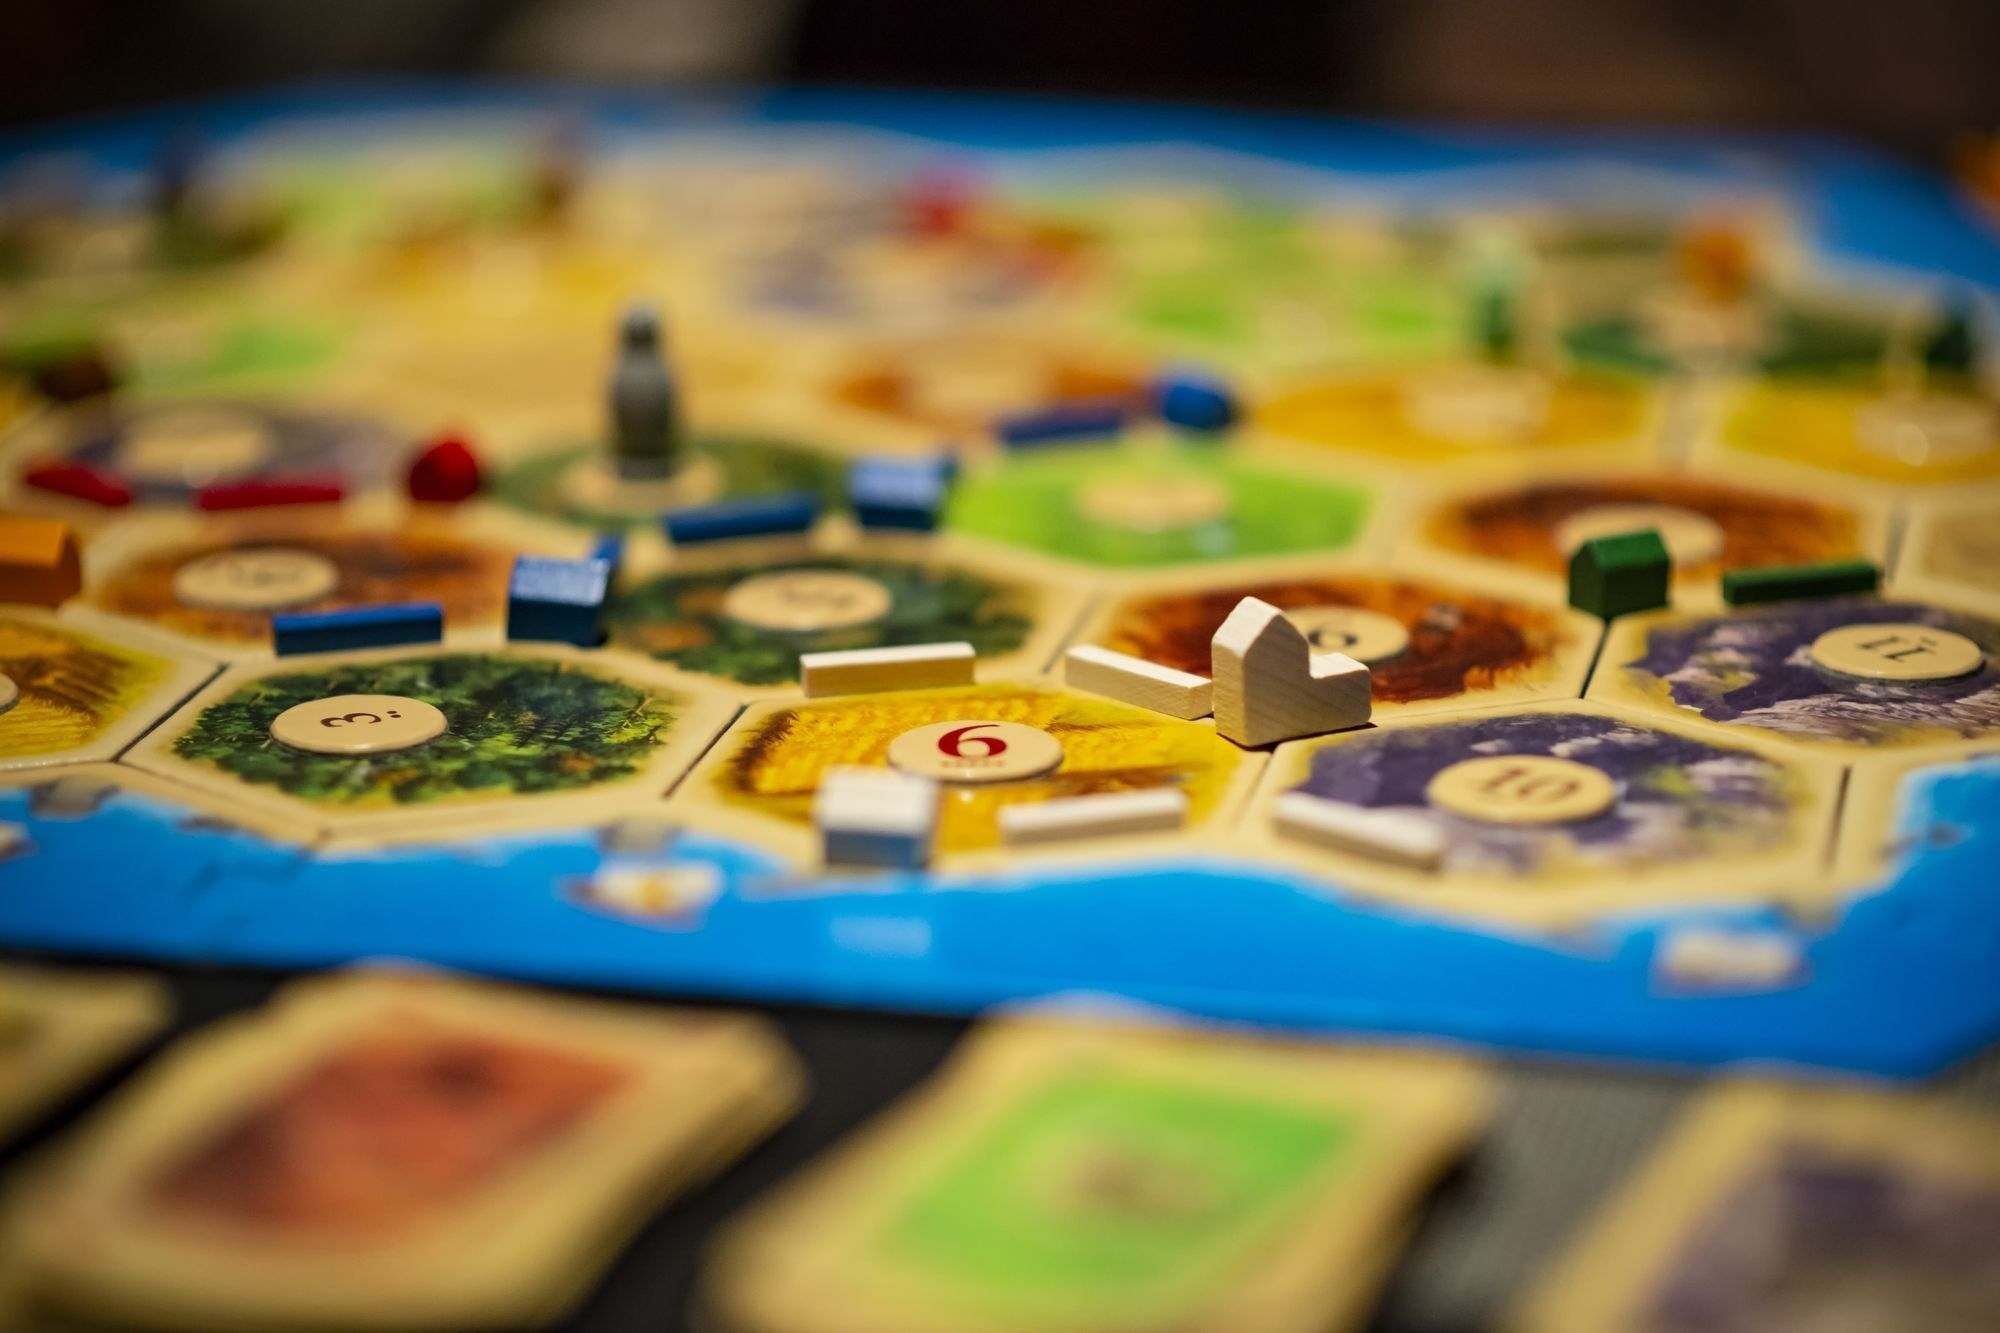 The board game that Mark Zuckerberg and Reid Hoffman